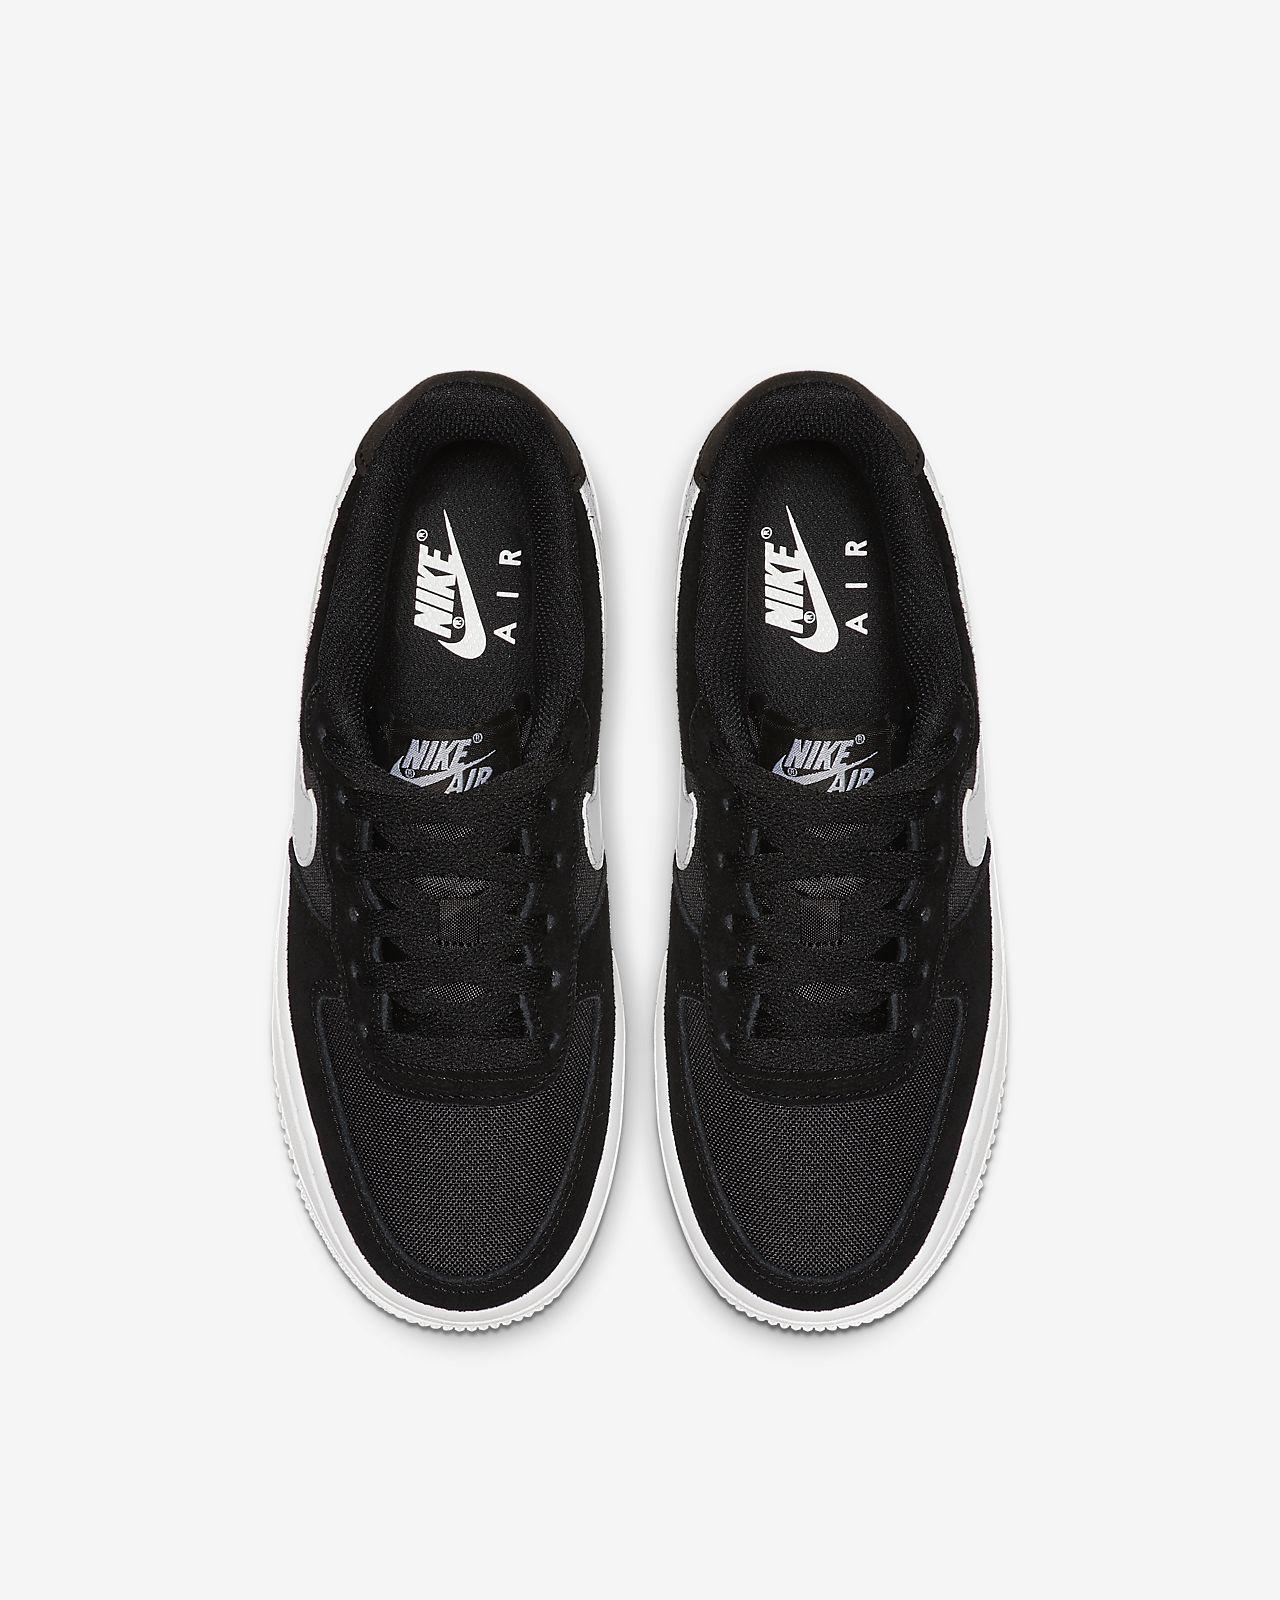 1003945f1b7 Nike Air Force 1 PE Kinderschoen. Nike.com BE